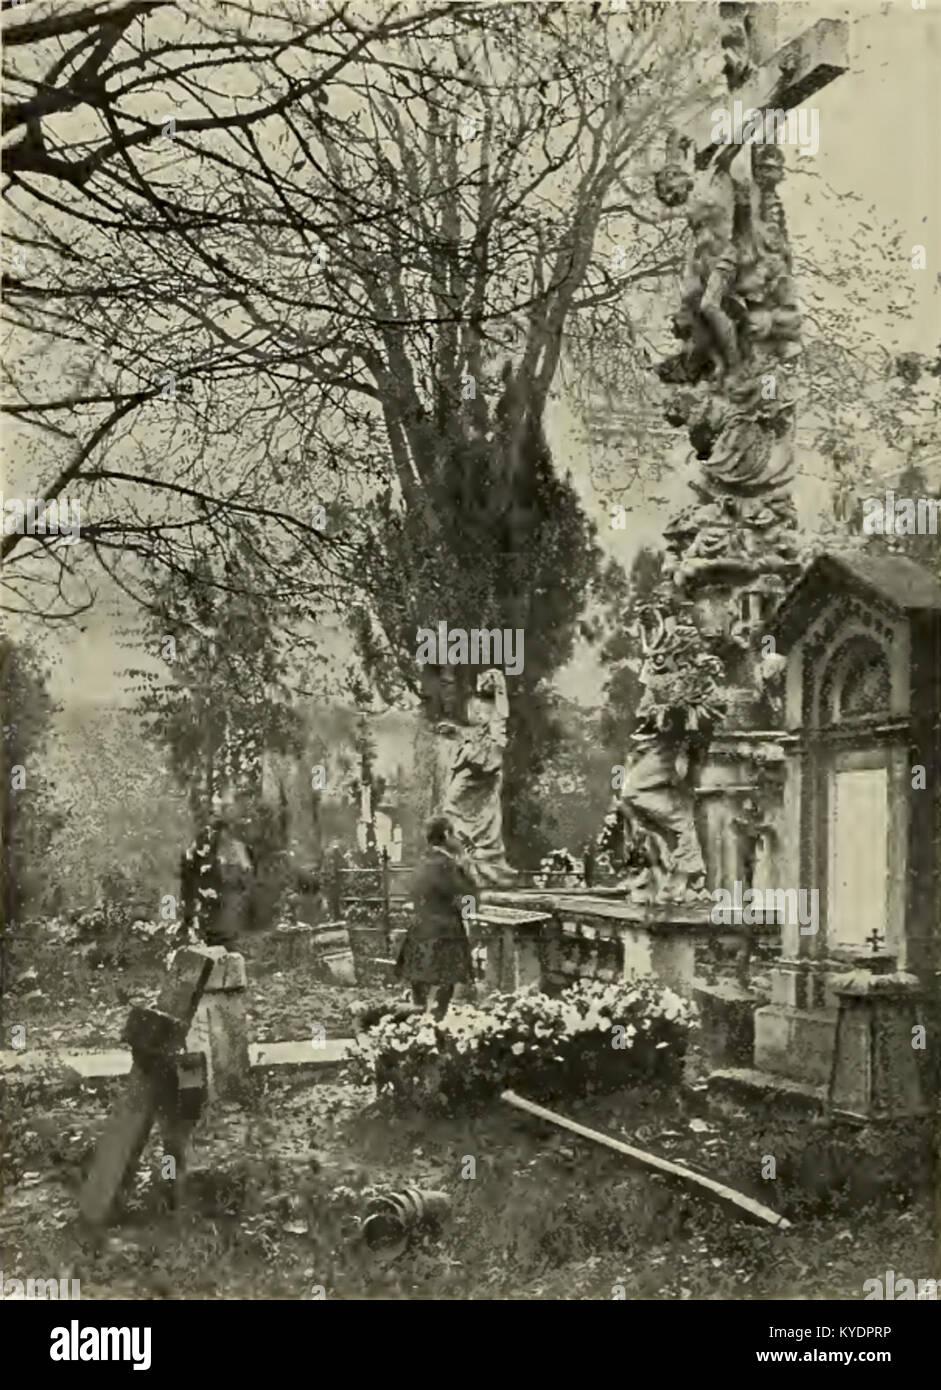 S 362 Abb 365 Partie aus dem Währinger Friedhofe Stock Photo